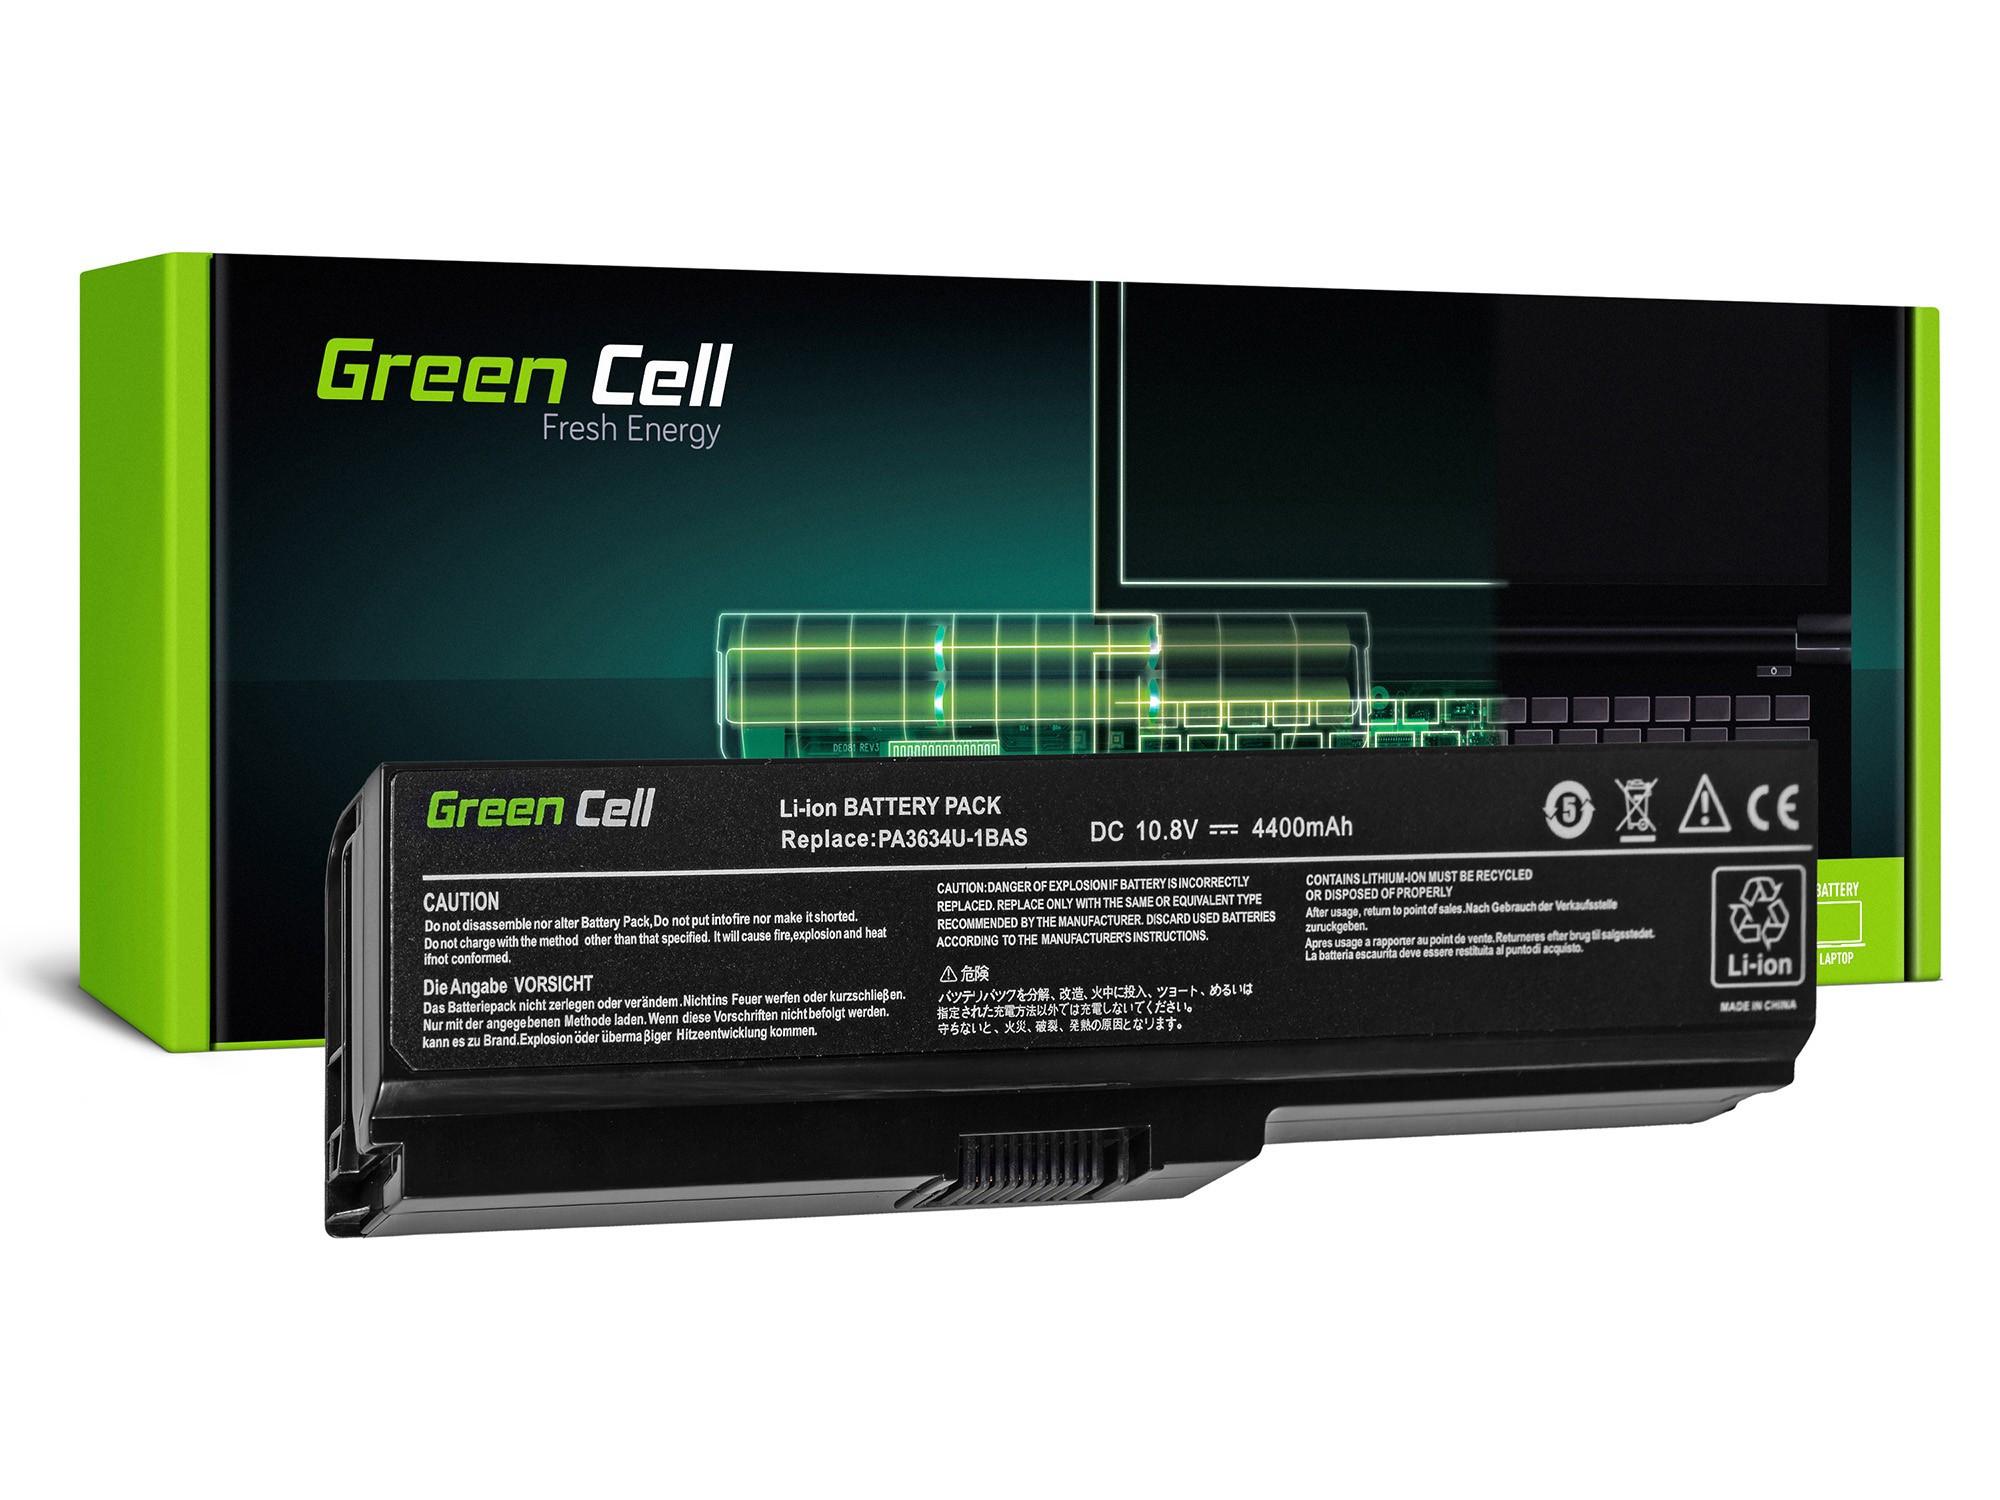 Green Cell TS03 Baterie Toshiba Satellite C650 C650D C660 C660D L650D L655 L750 4400mAh Li-ion - neoriginální